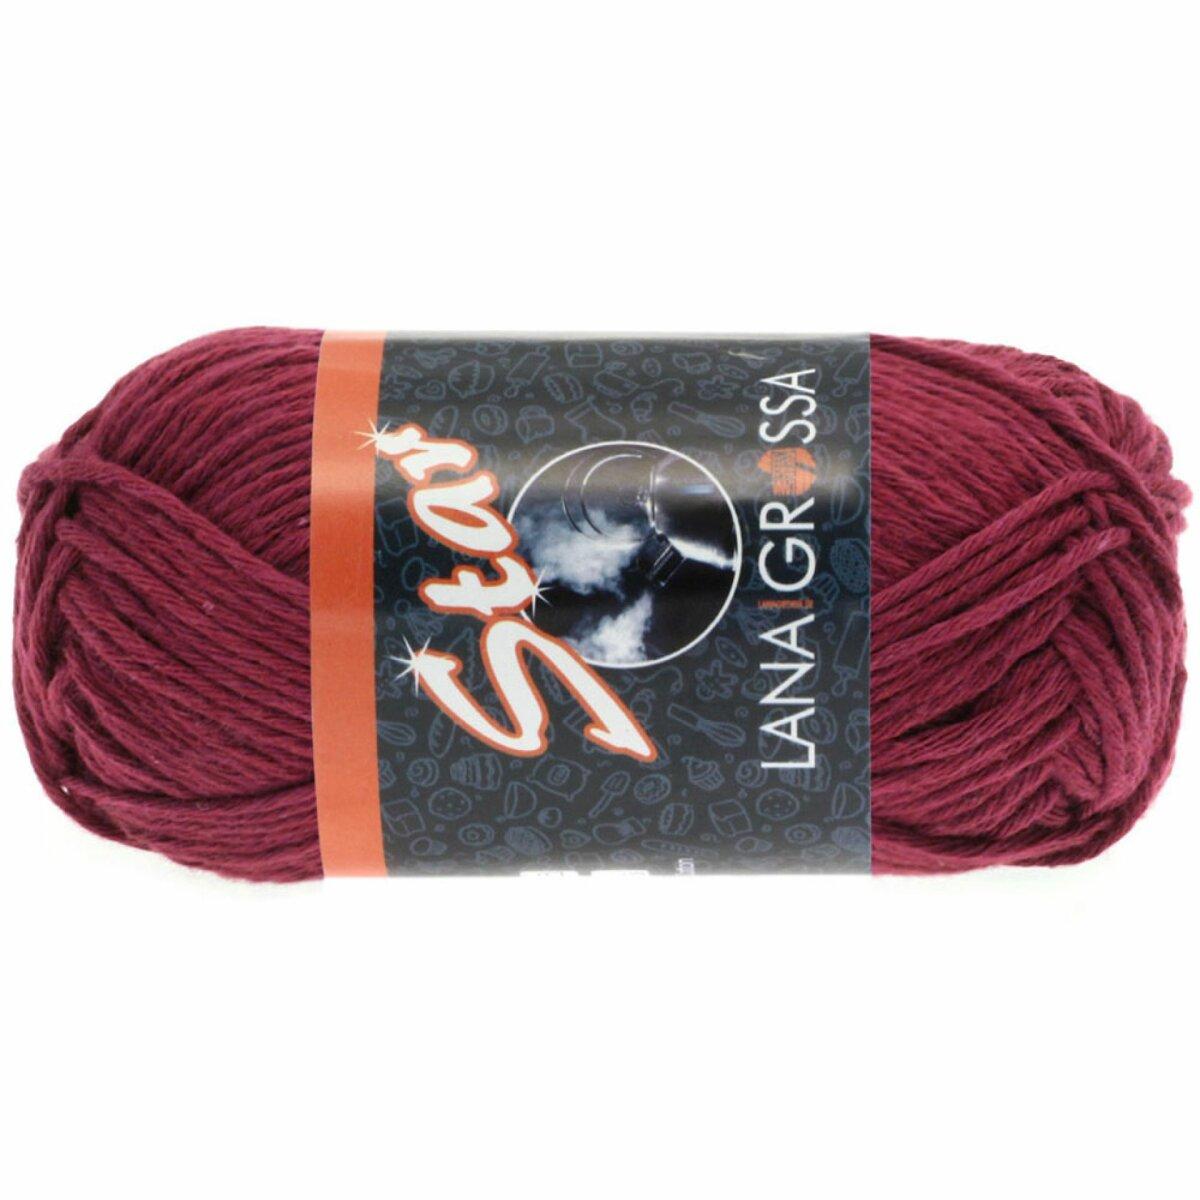 Fb 57 weinrot 50 g Lana Grossa Star Wolle Kreativ